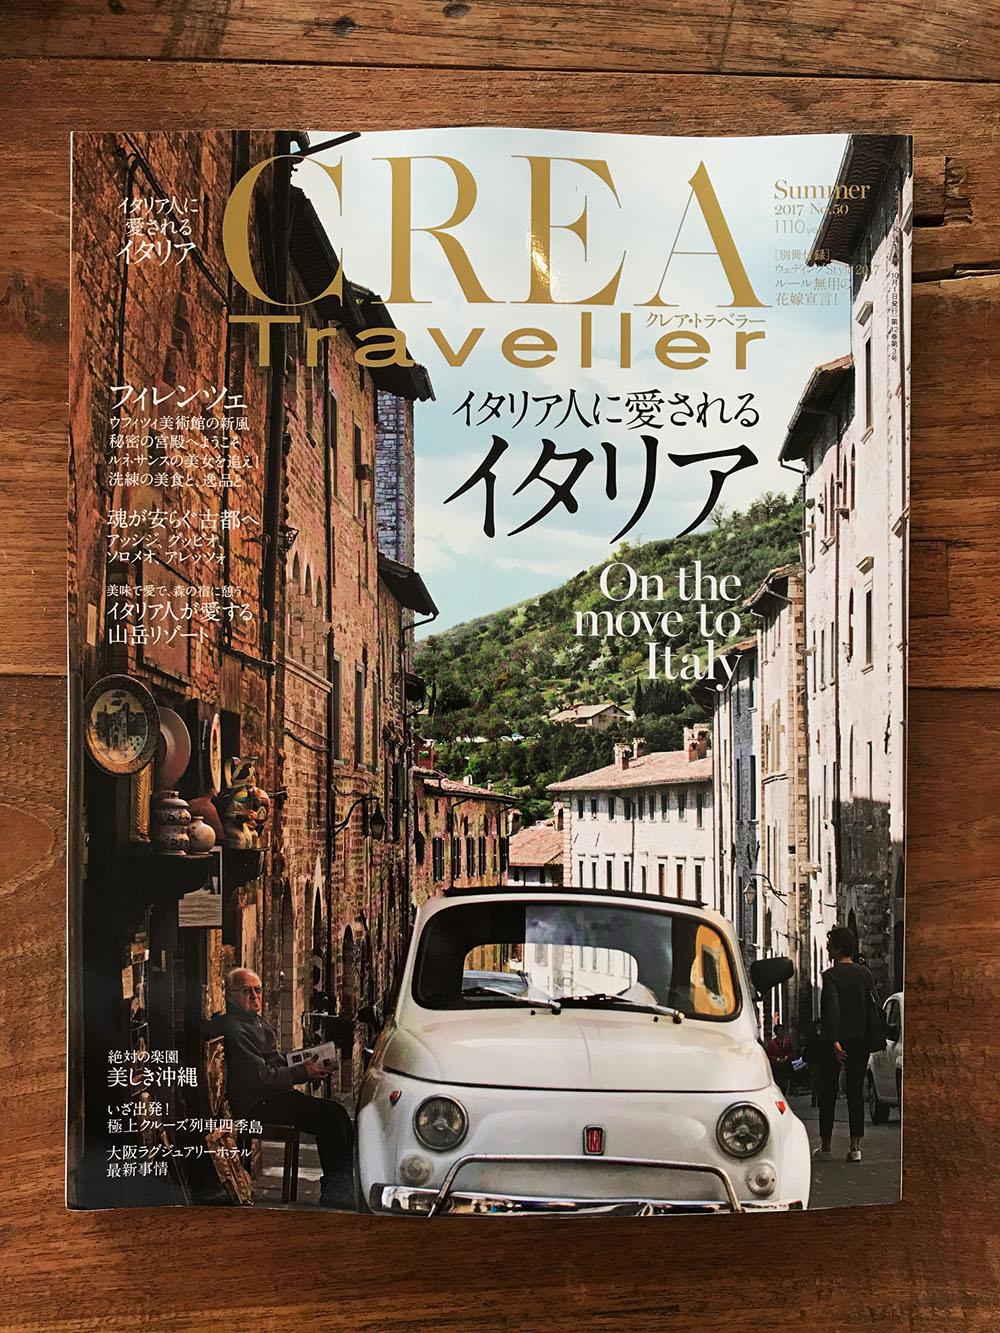 CREA Traveller 2017年夏号